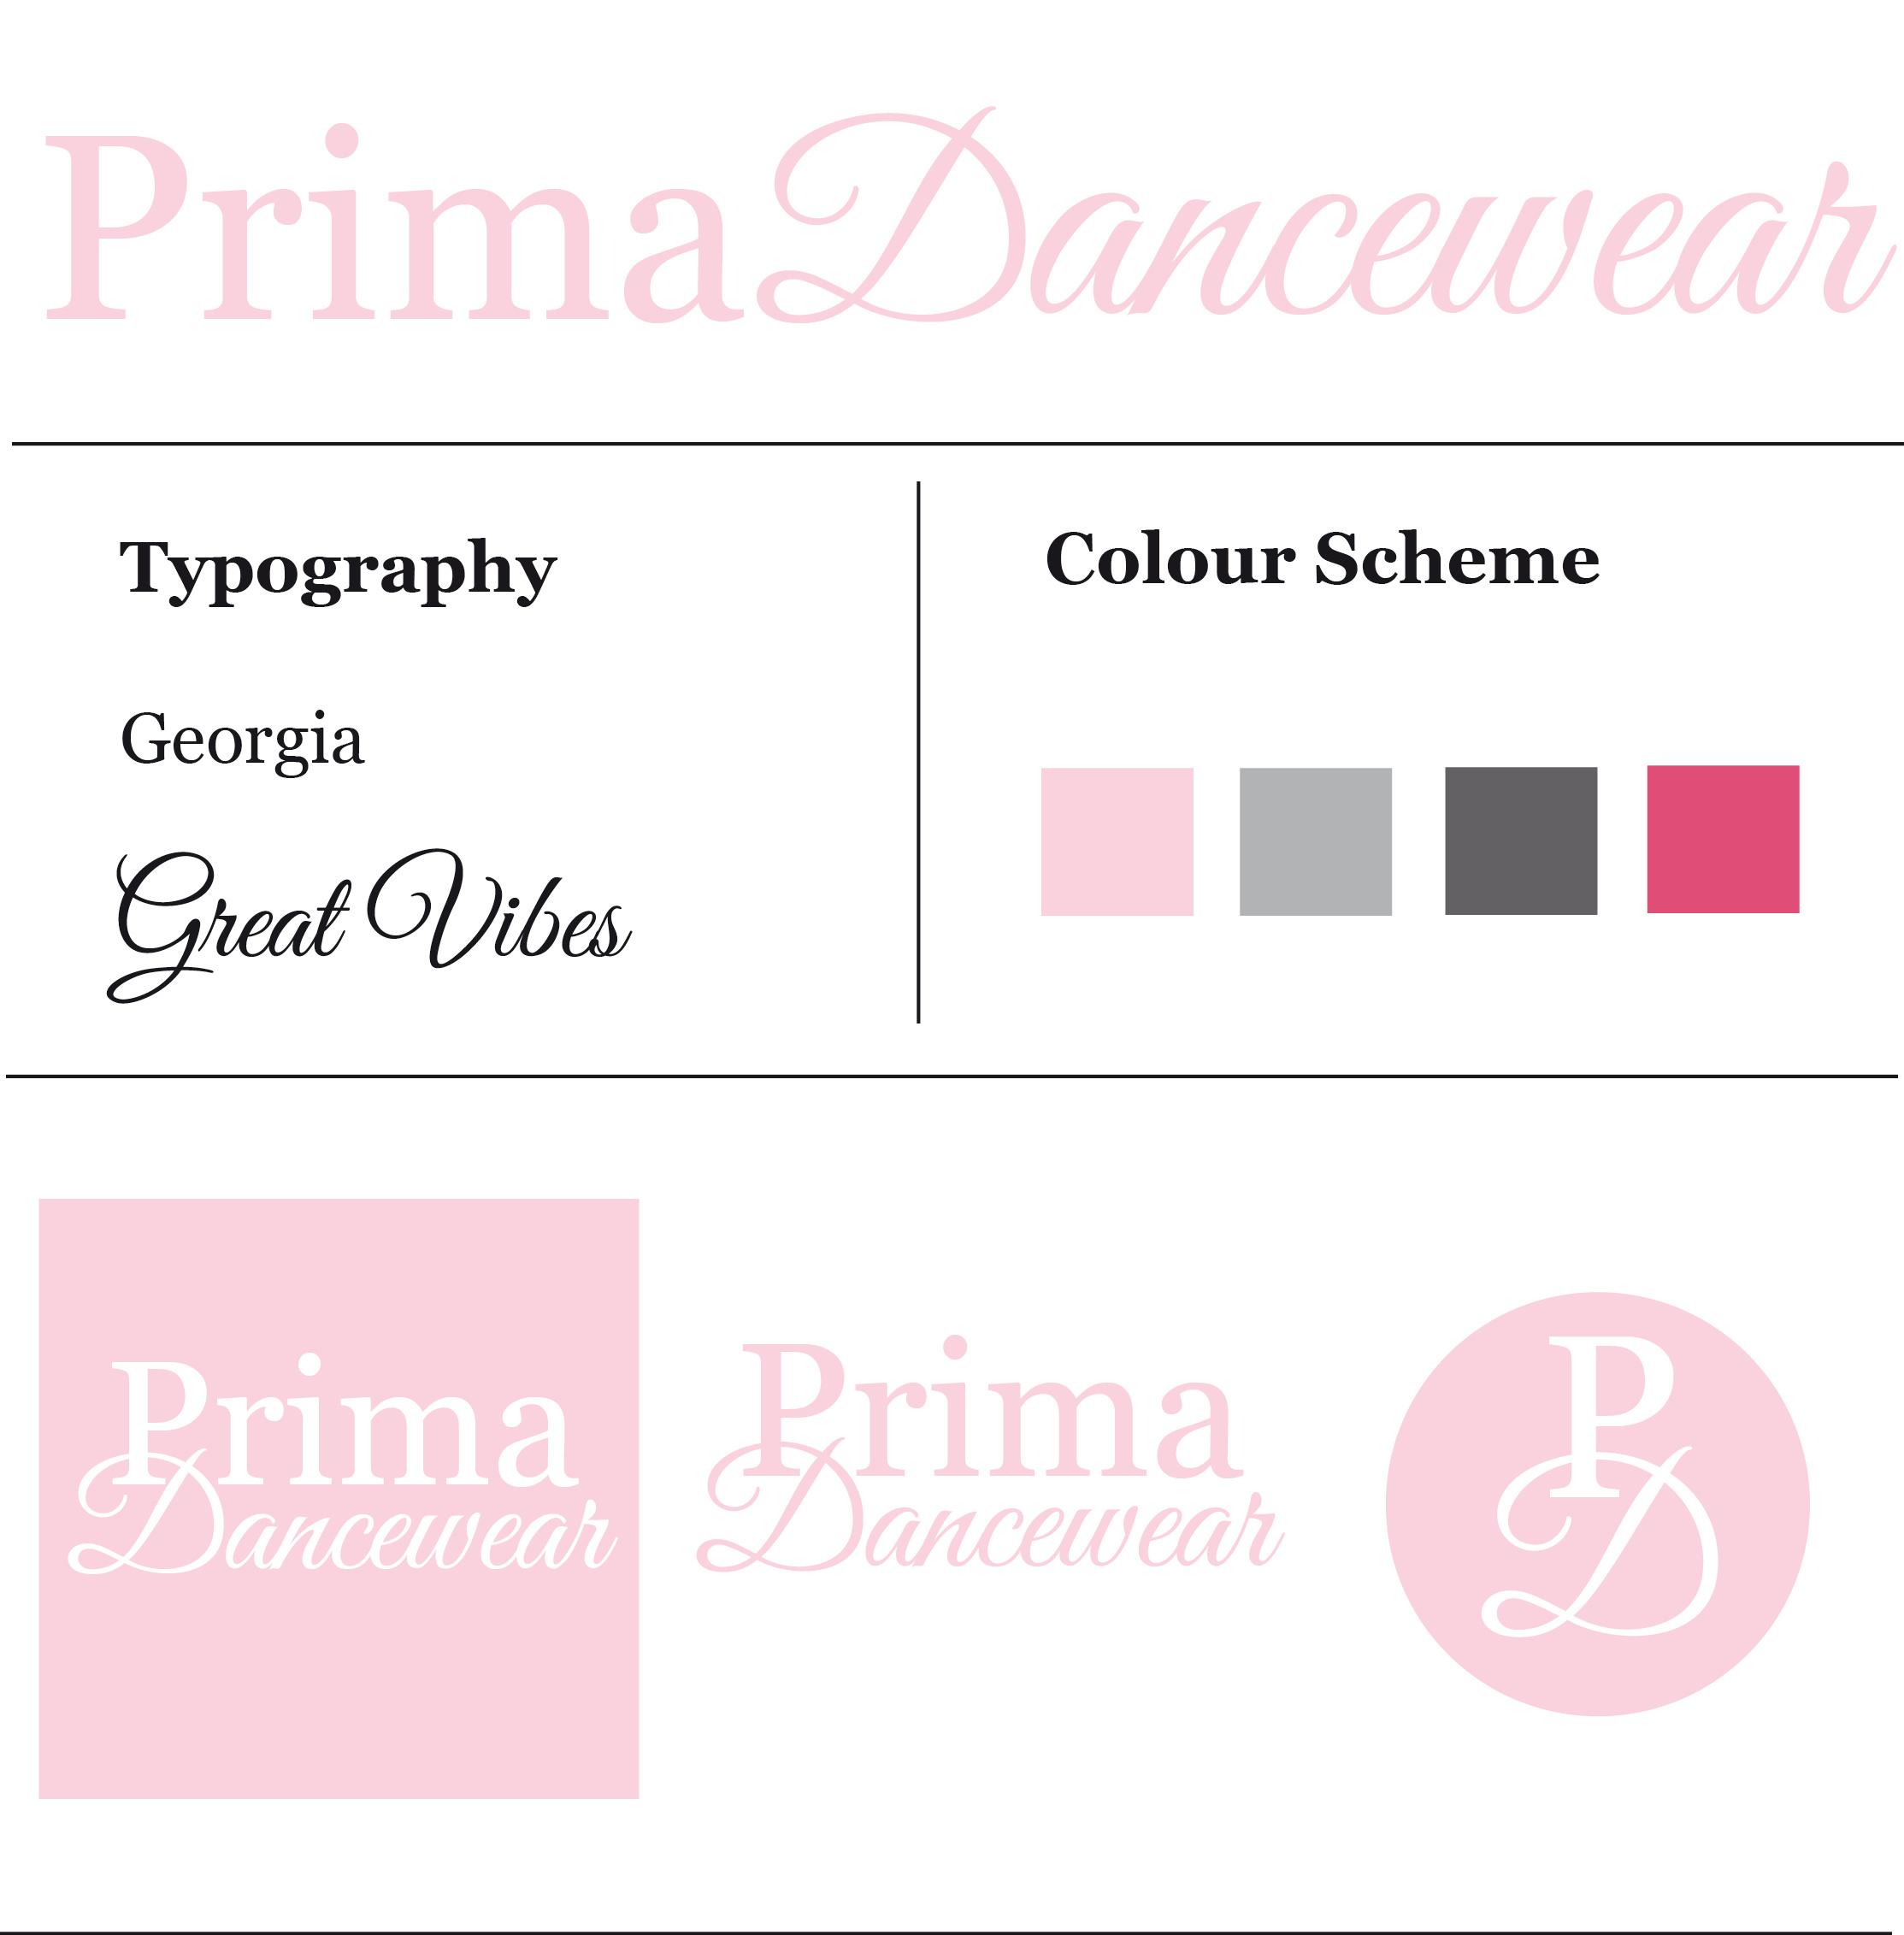 Prima Dancewear